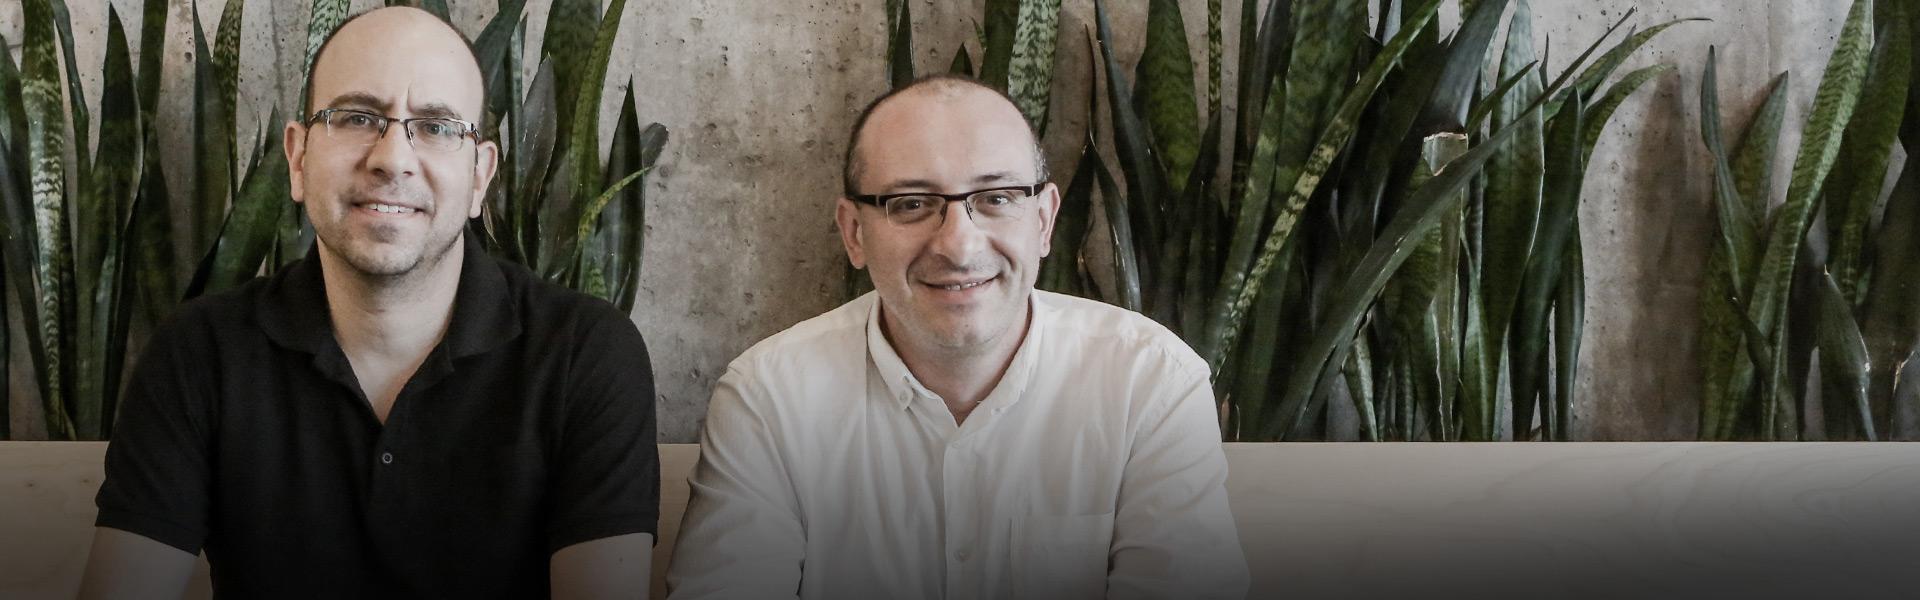 Promising Startups - סטארטאפים- feedvisor / צילום: שלומי יוסף